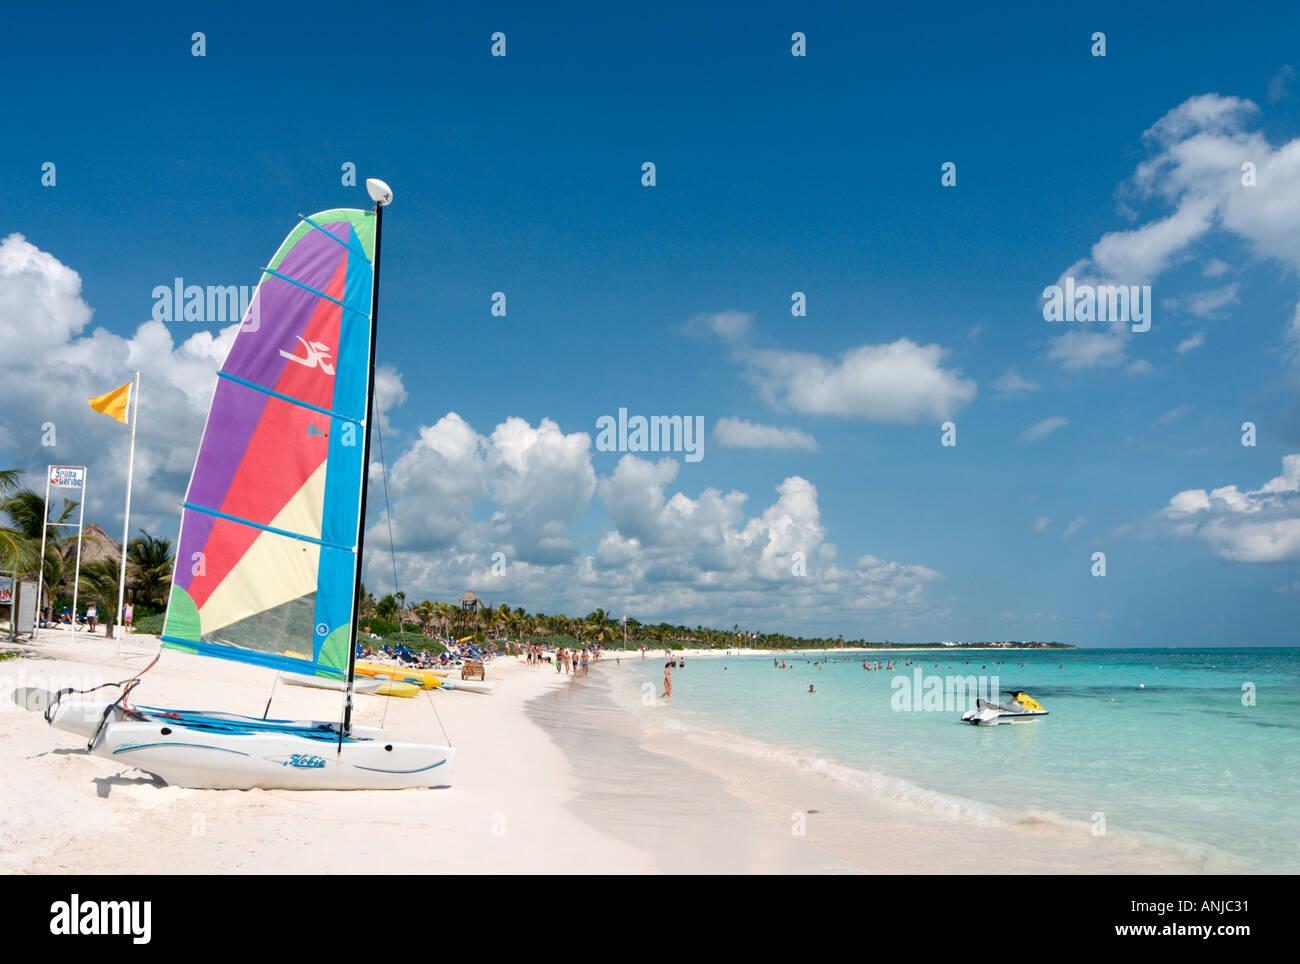 Beach outside Hotel Grand Palladium Colonial near Puerto Aventuras, Riviera Maya, Yucatan Peninsula, Mexico - Stock Image